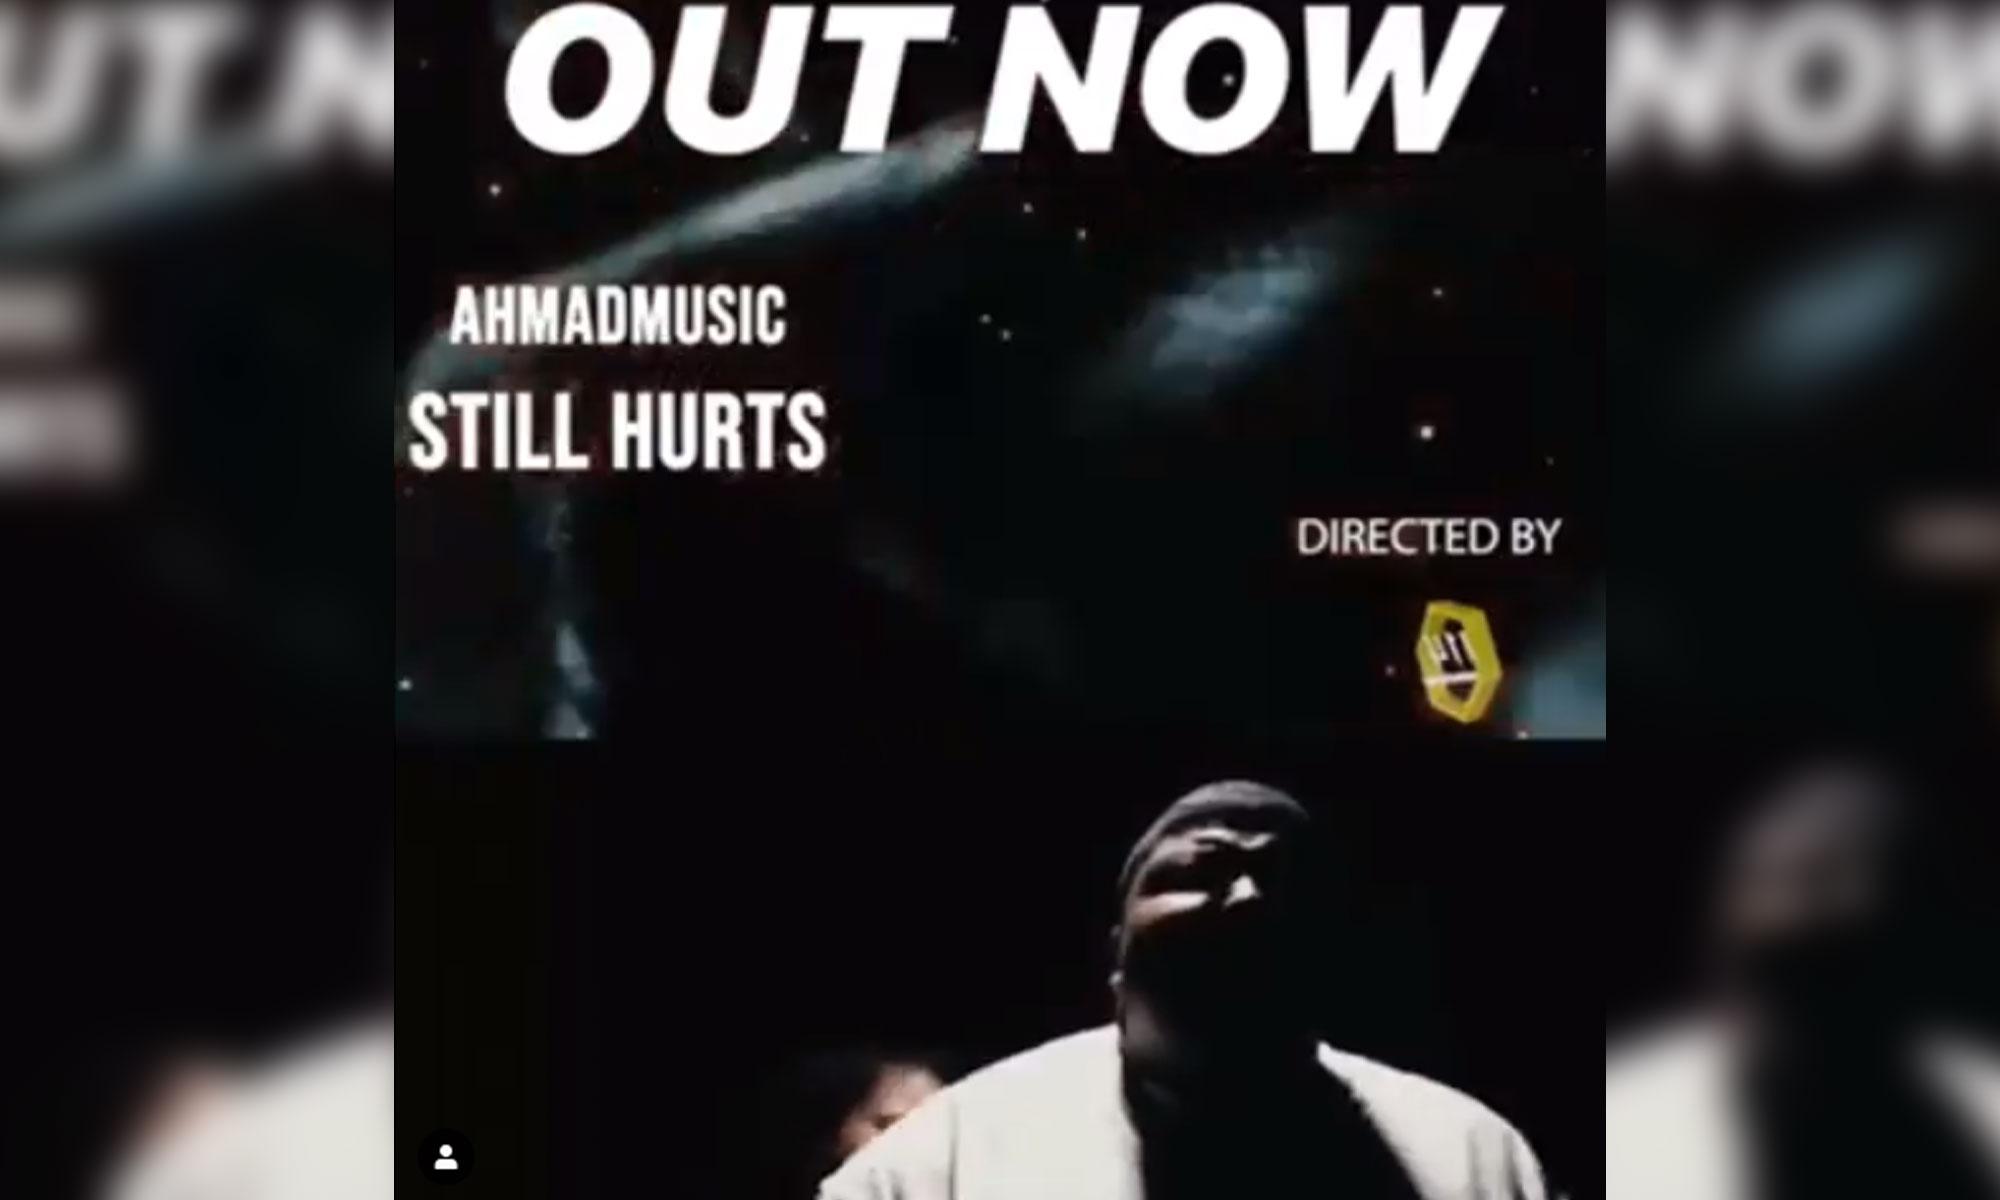 Still Hurts by AHMADMUSIC